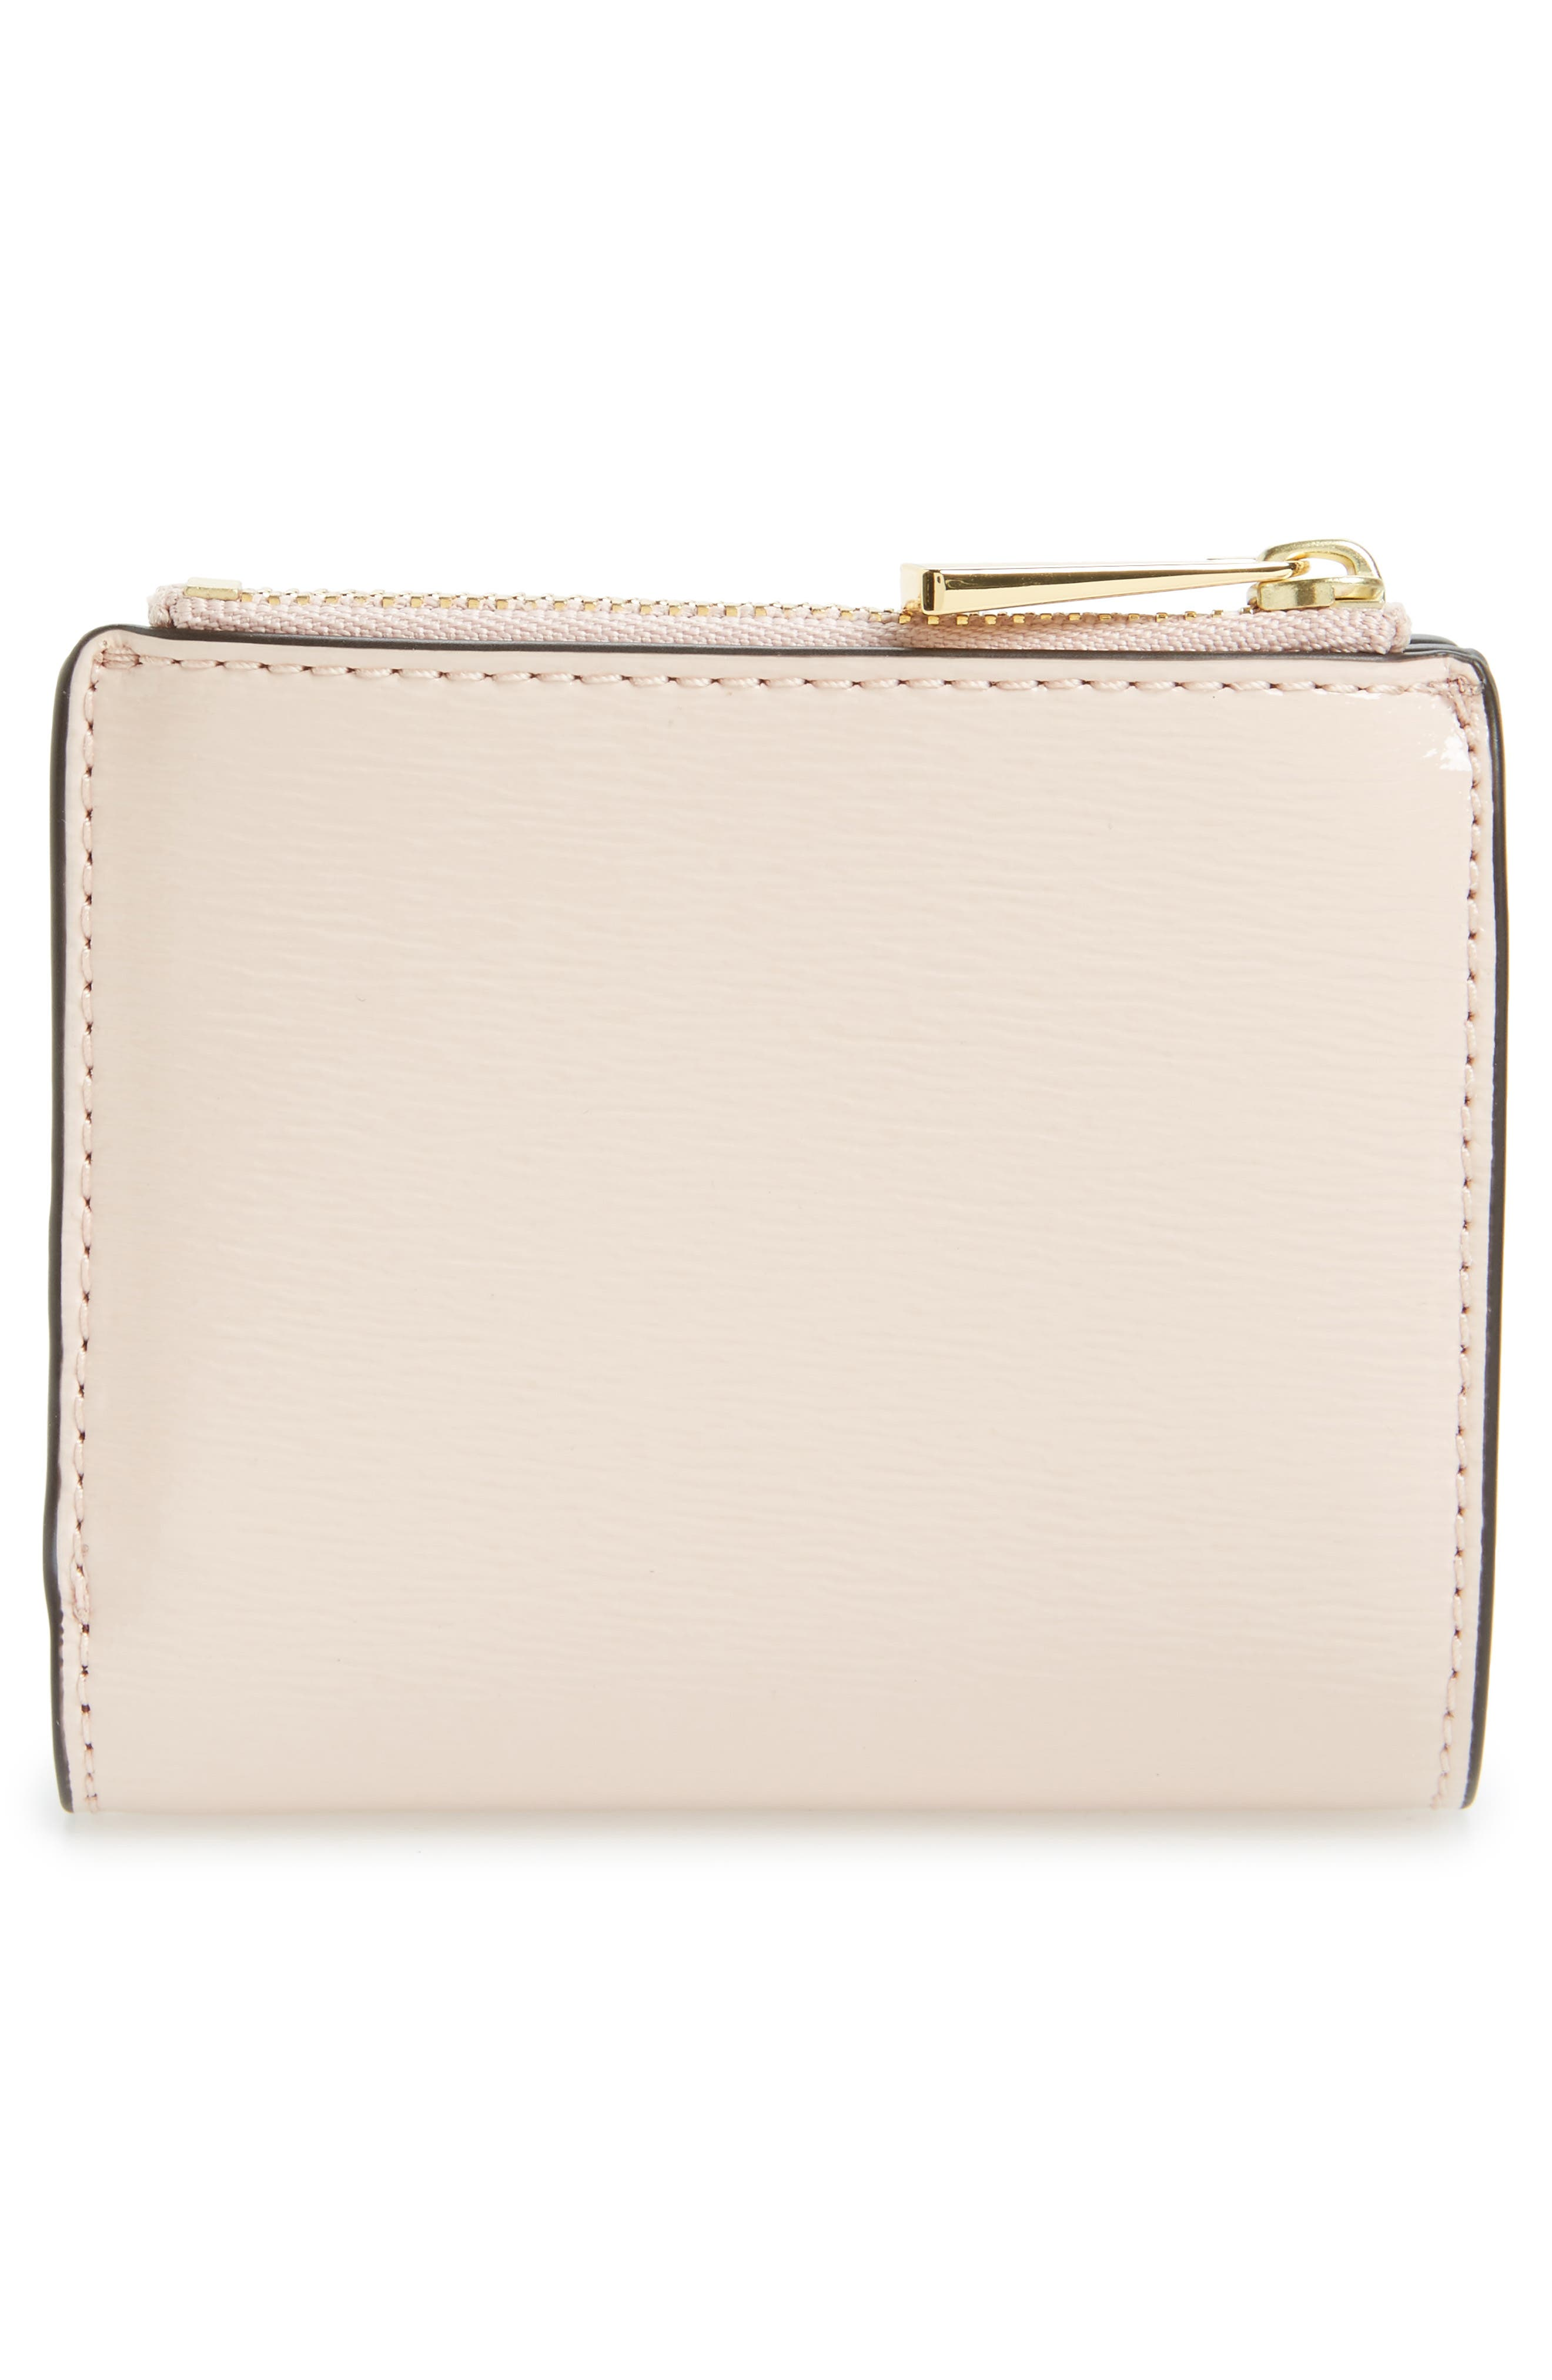 Mini Robinson Wallet Patent Leather Bifold Wallet,                             Alternate thumbnail 12, color,